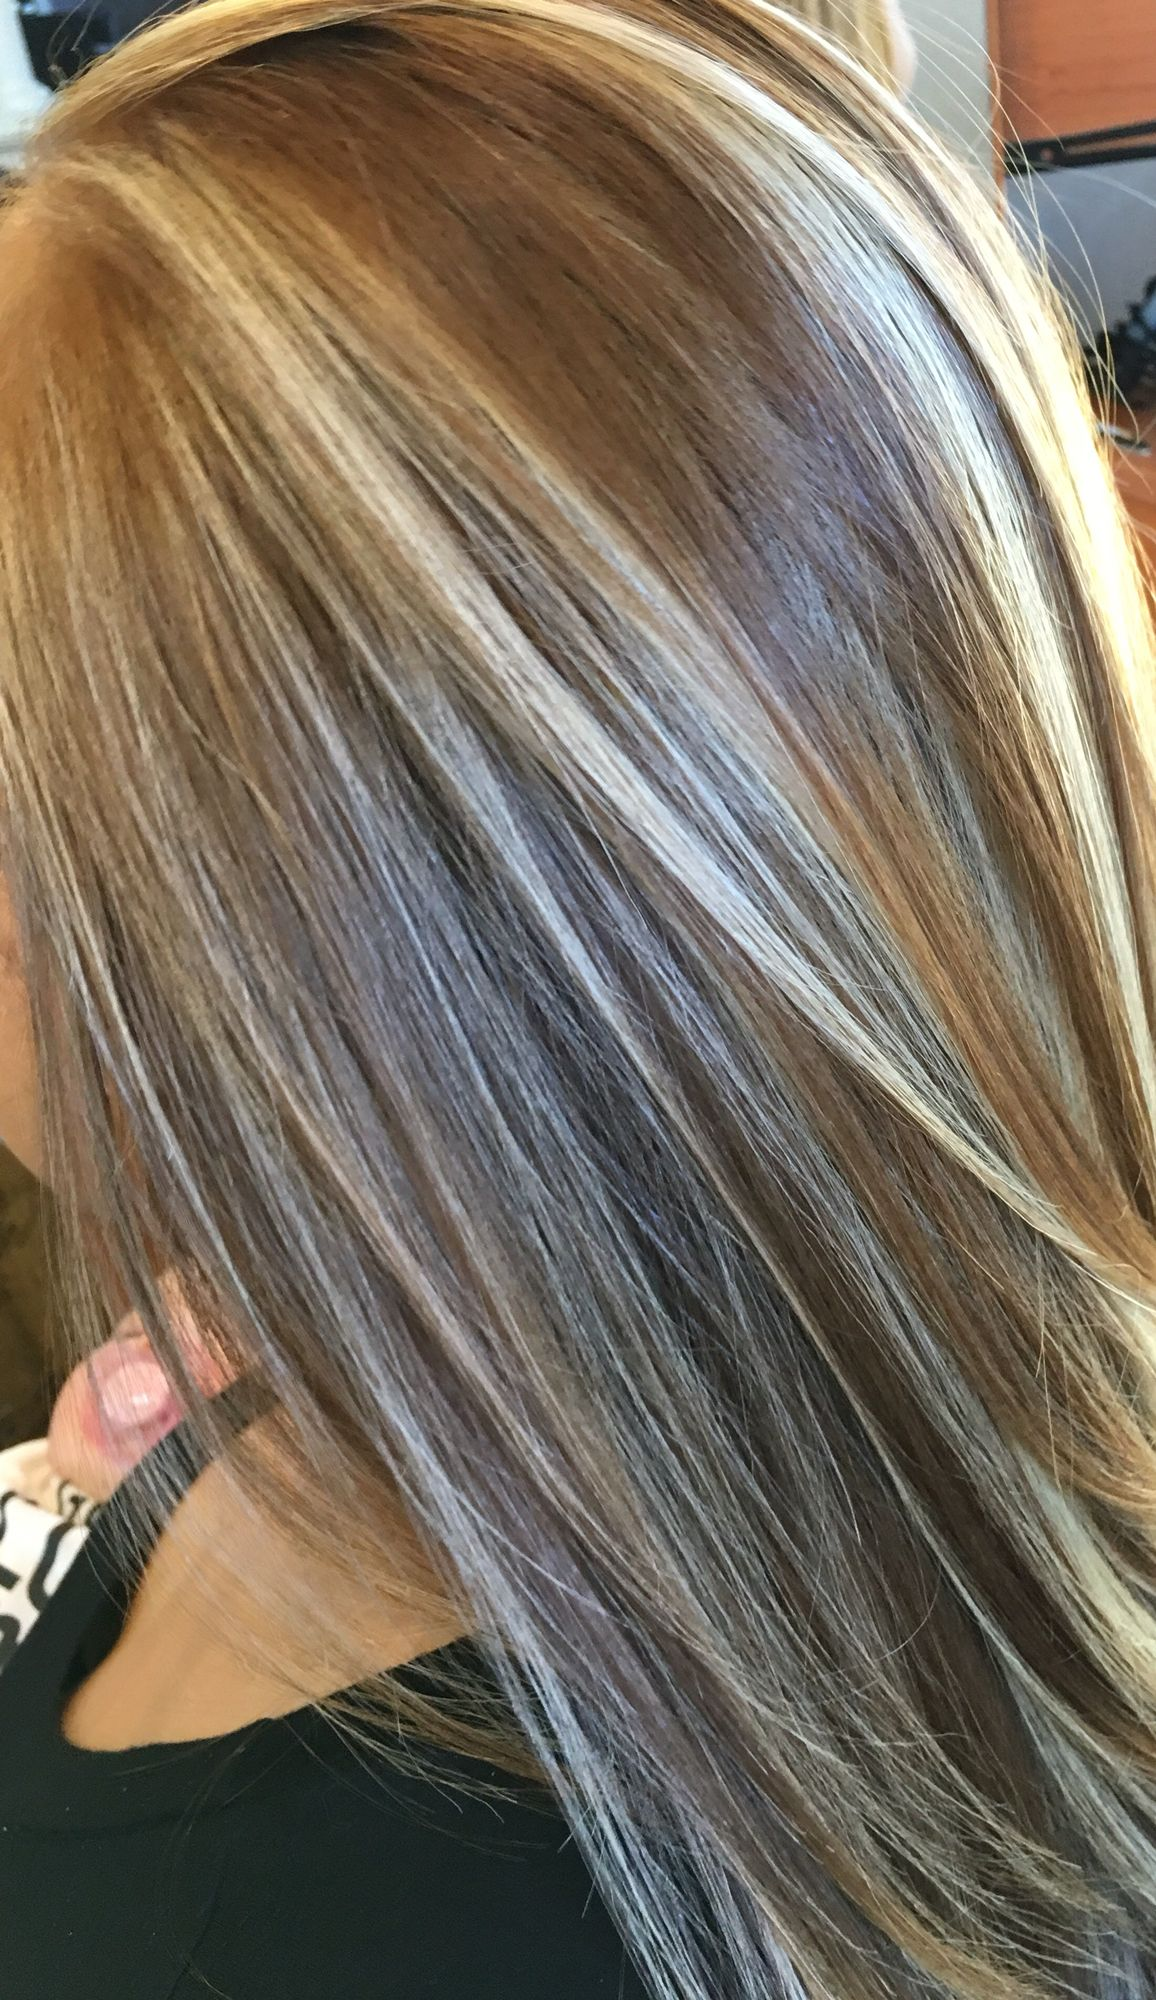 Dark Blonde With Highlights Straight Hair Highlights Hair Highlights Blonde Highlights